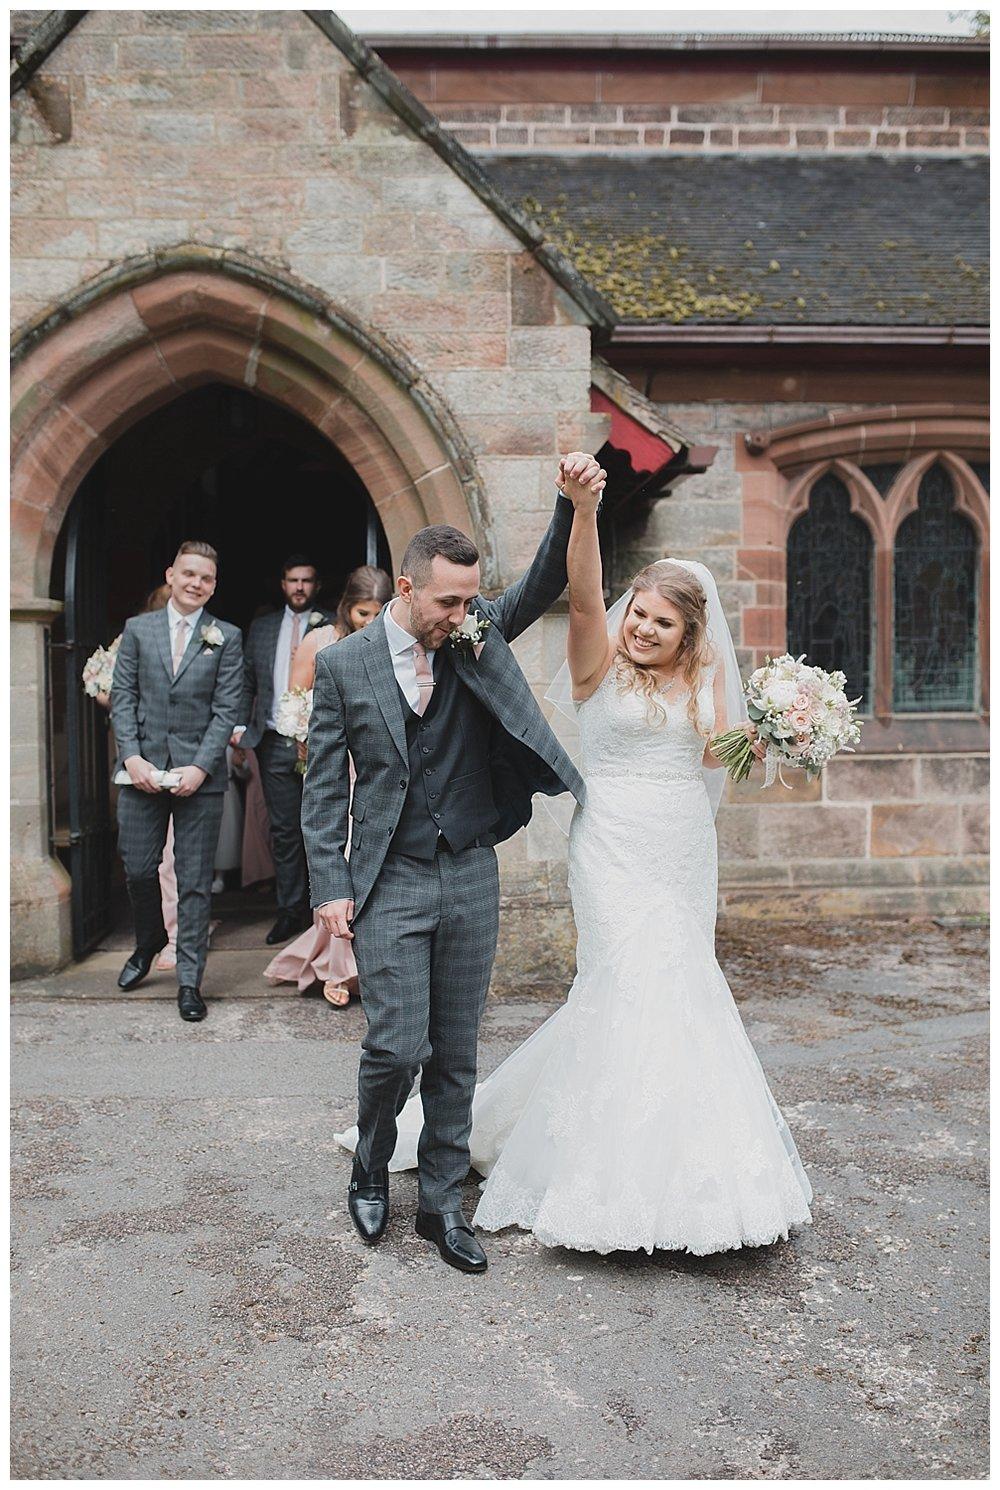 The newlyweds celebrate at St. Luke's Church Endon, Stoke.